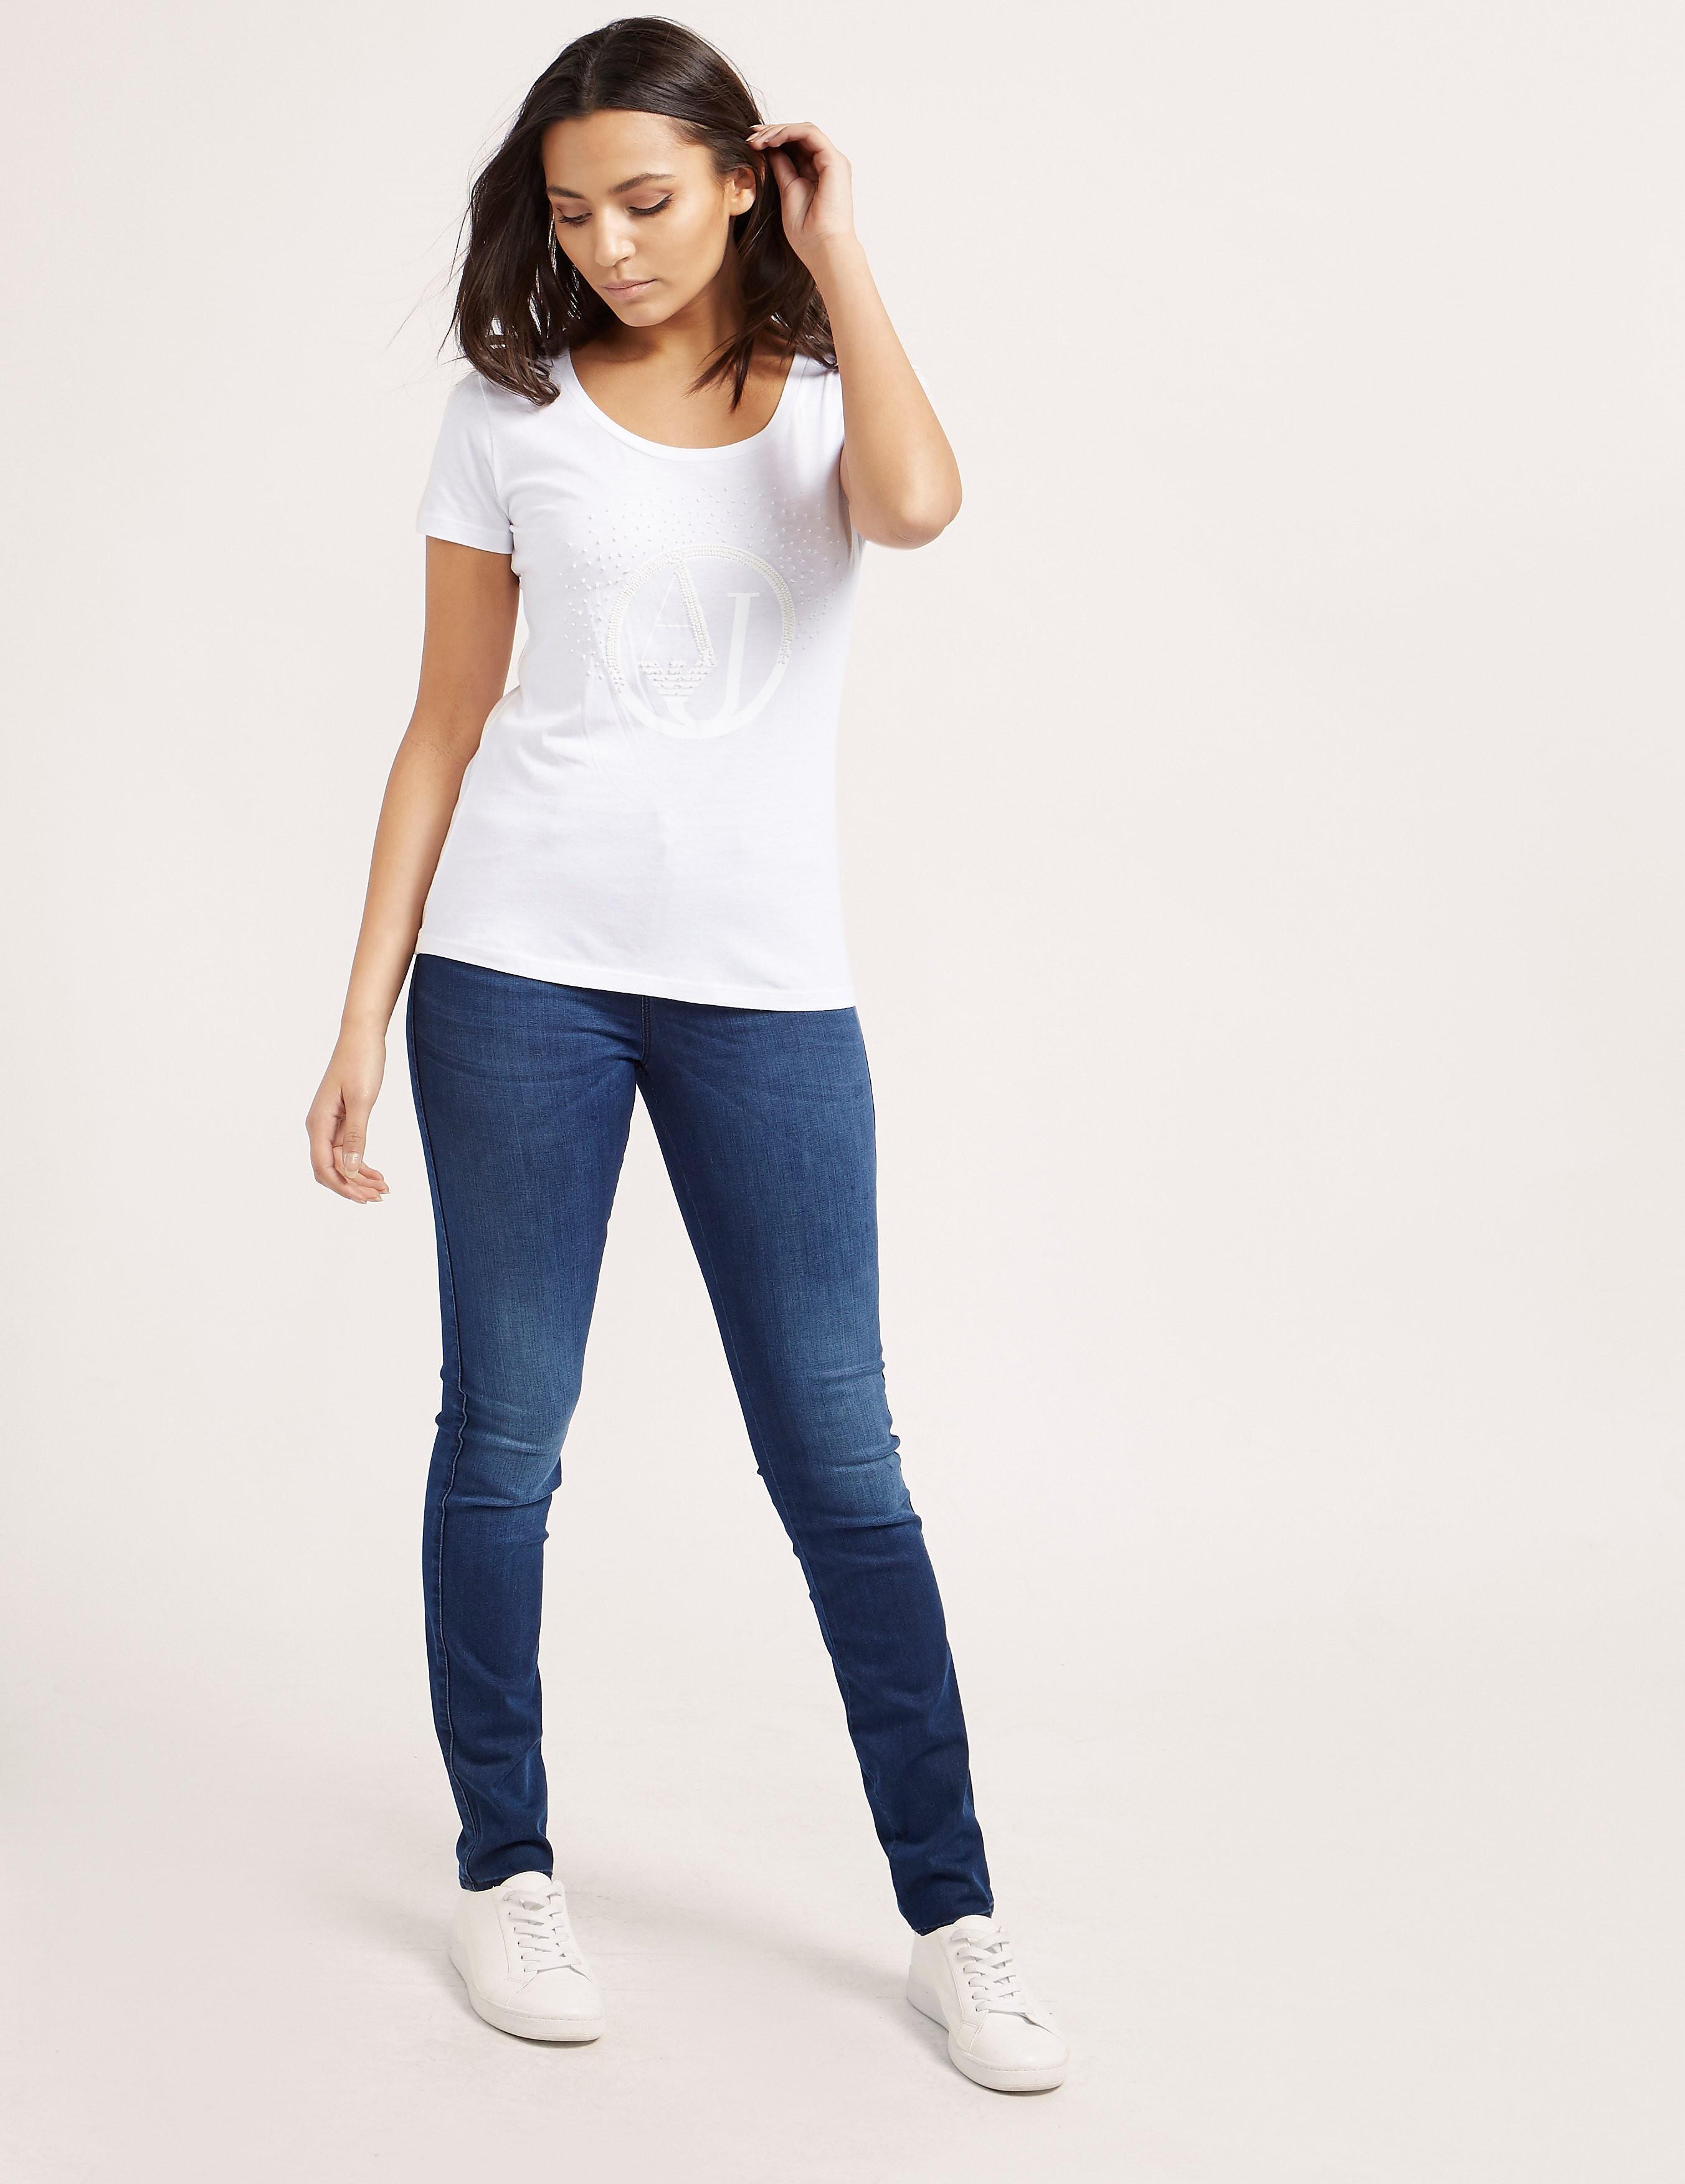 Armani Jeans Beaded Short Sleeve T-Shirt